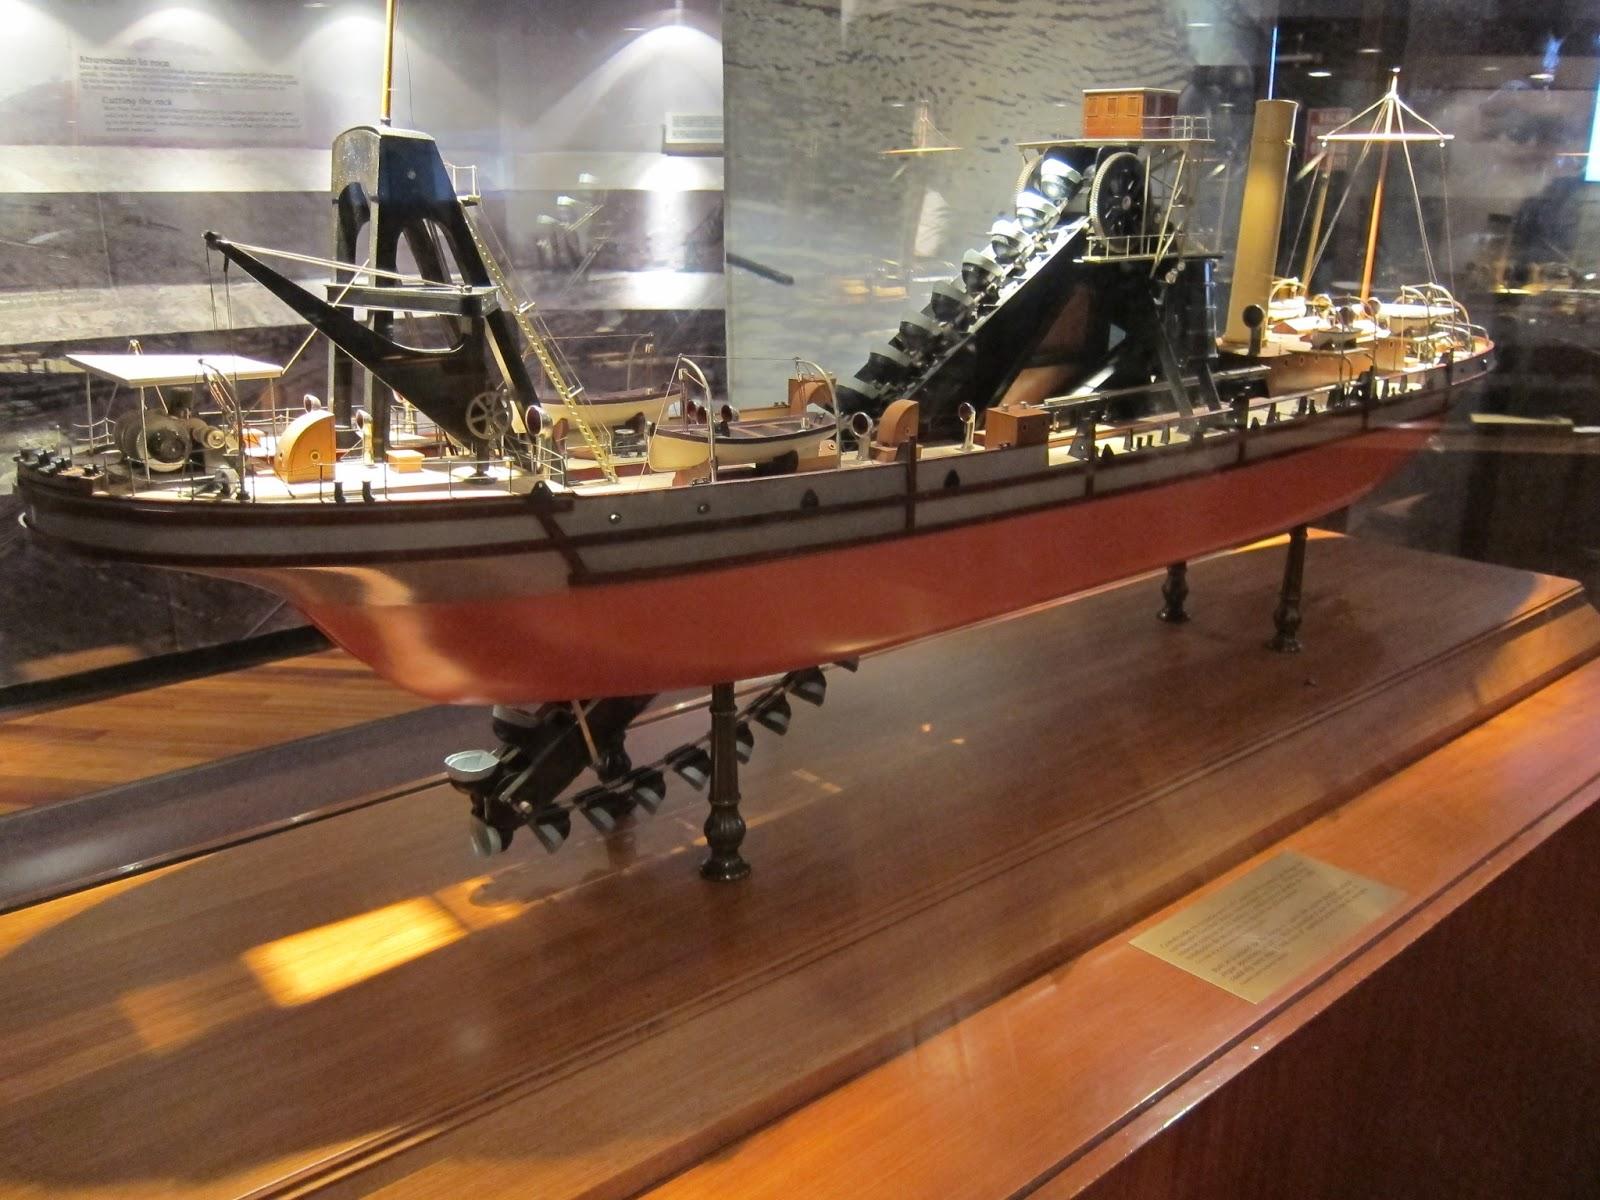 Exponat din Muzeul Canalul Panama